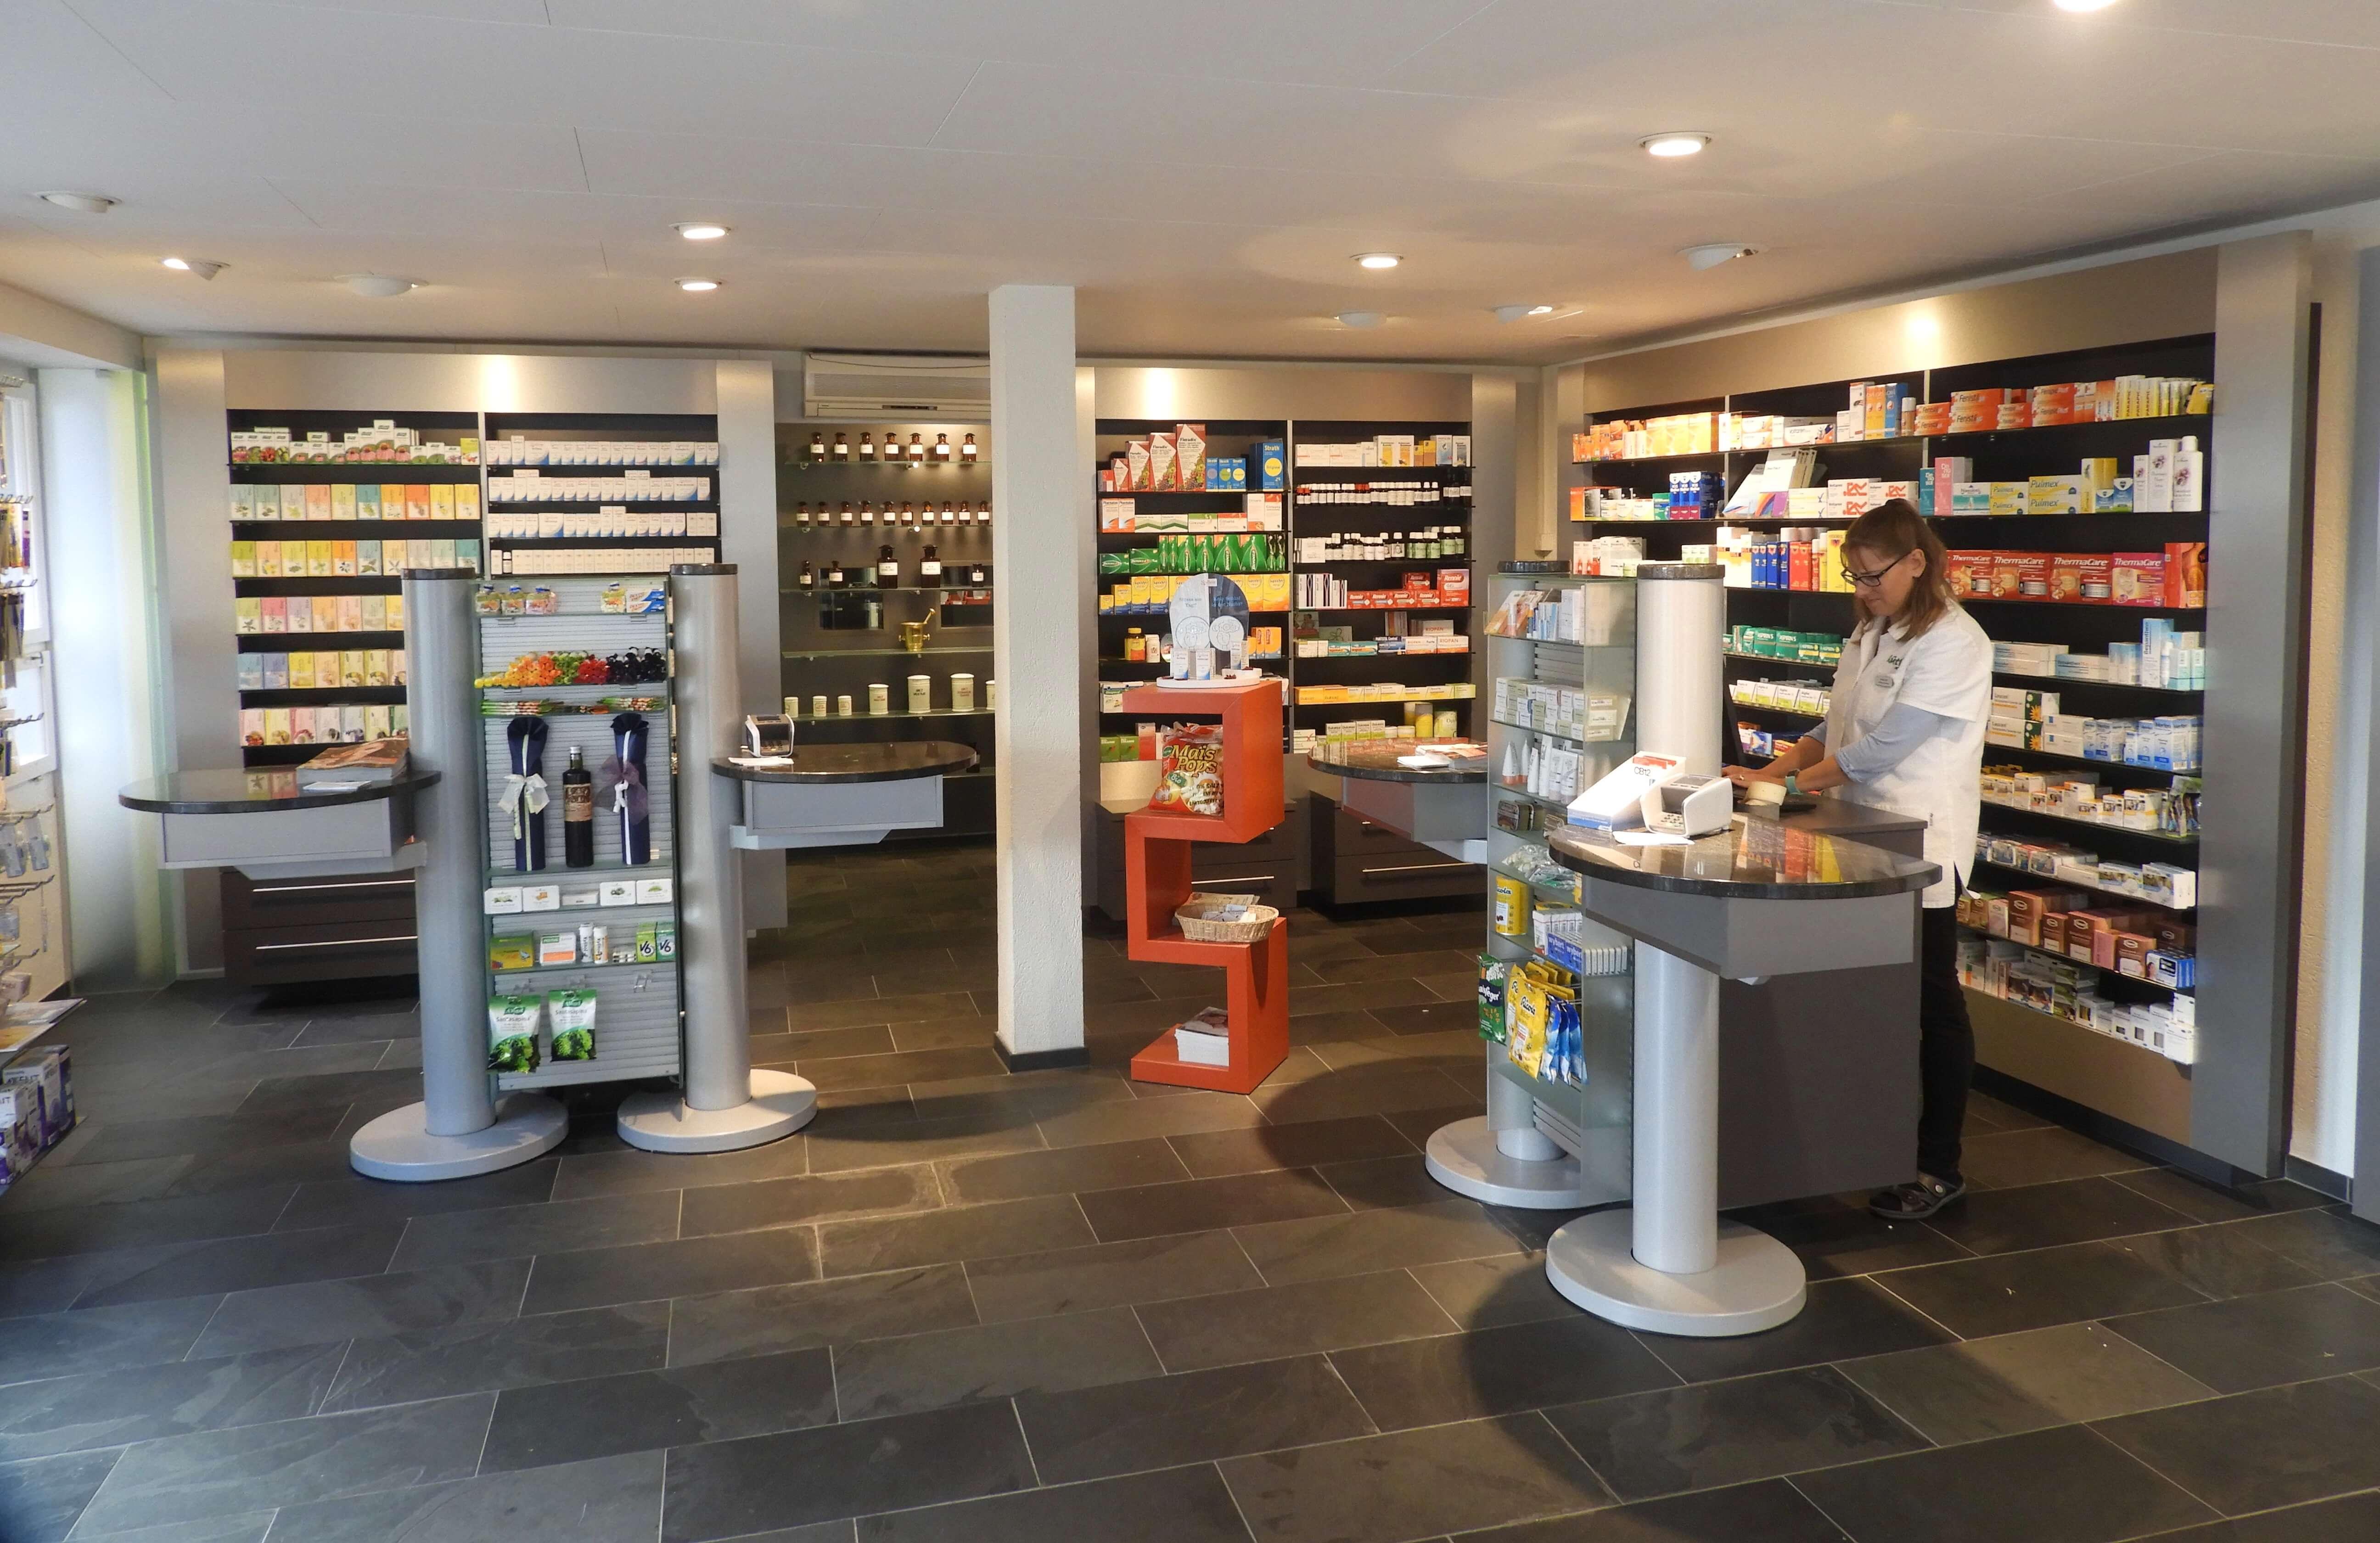 Verkaufsraum_Rütli_Apotheke_Brunnen c